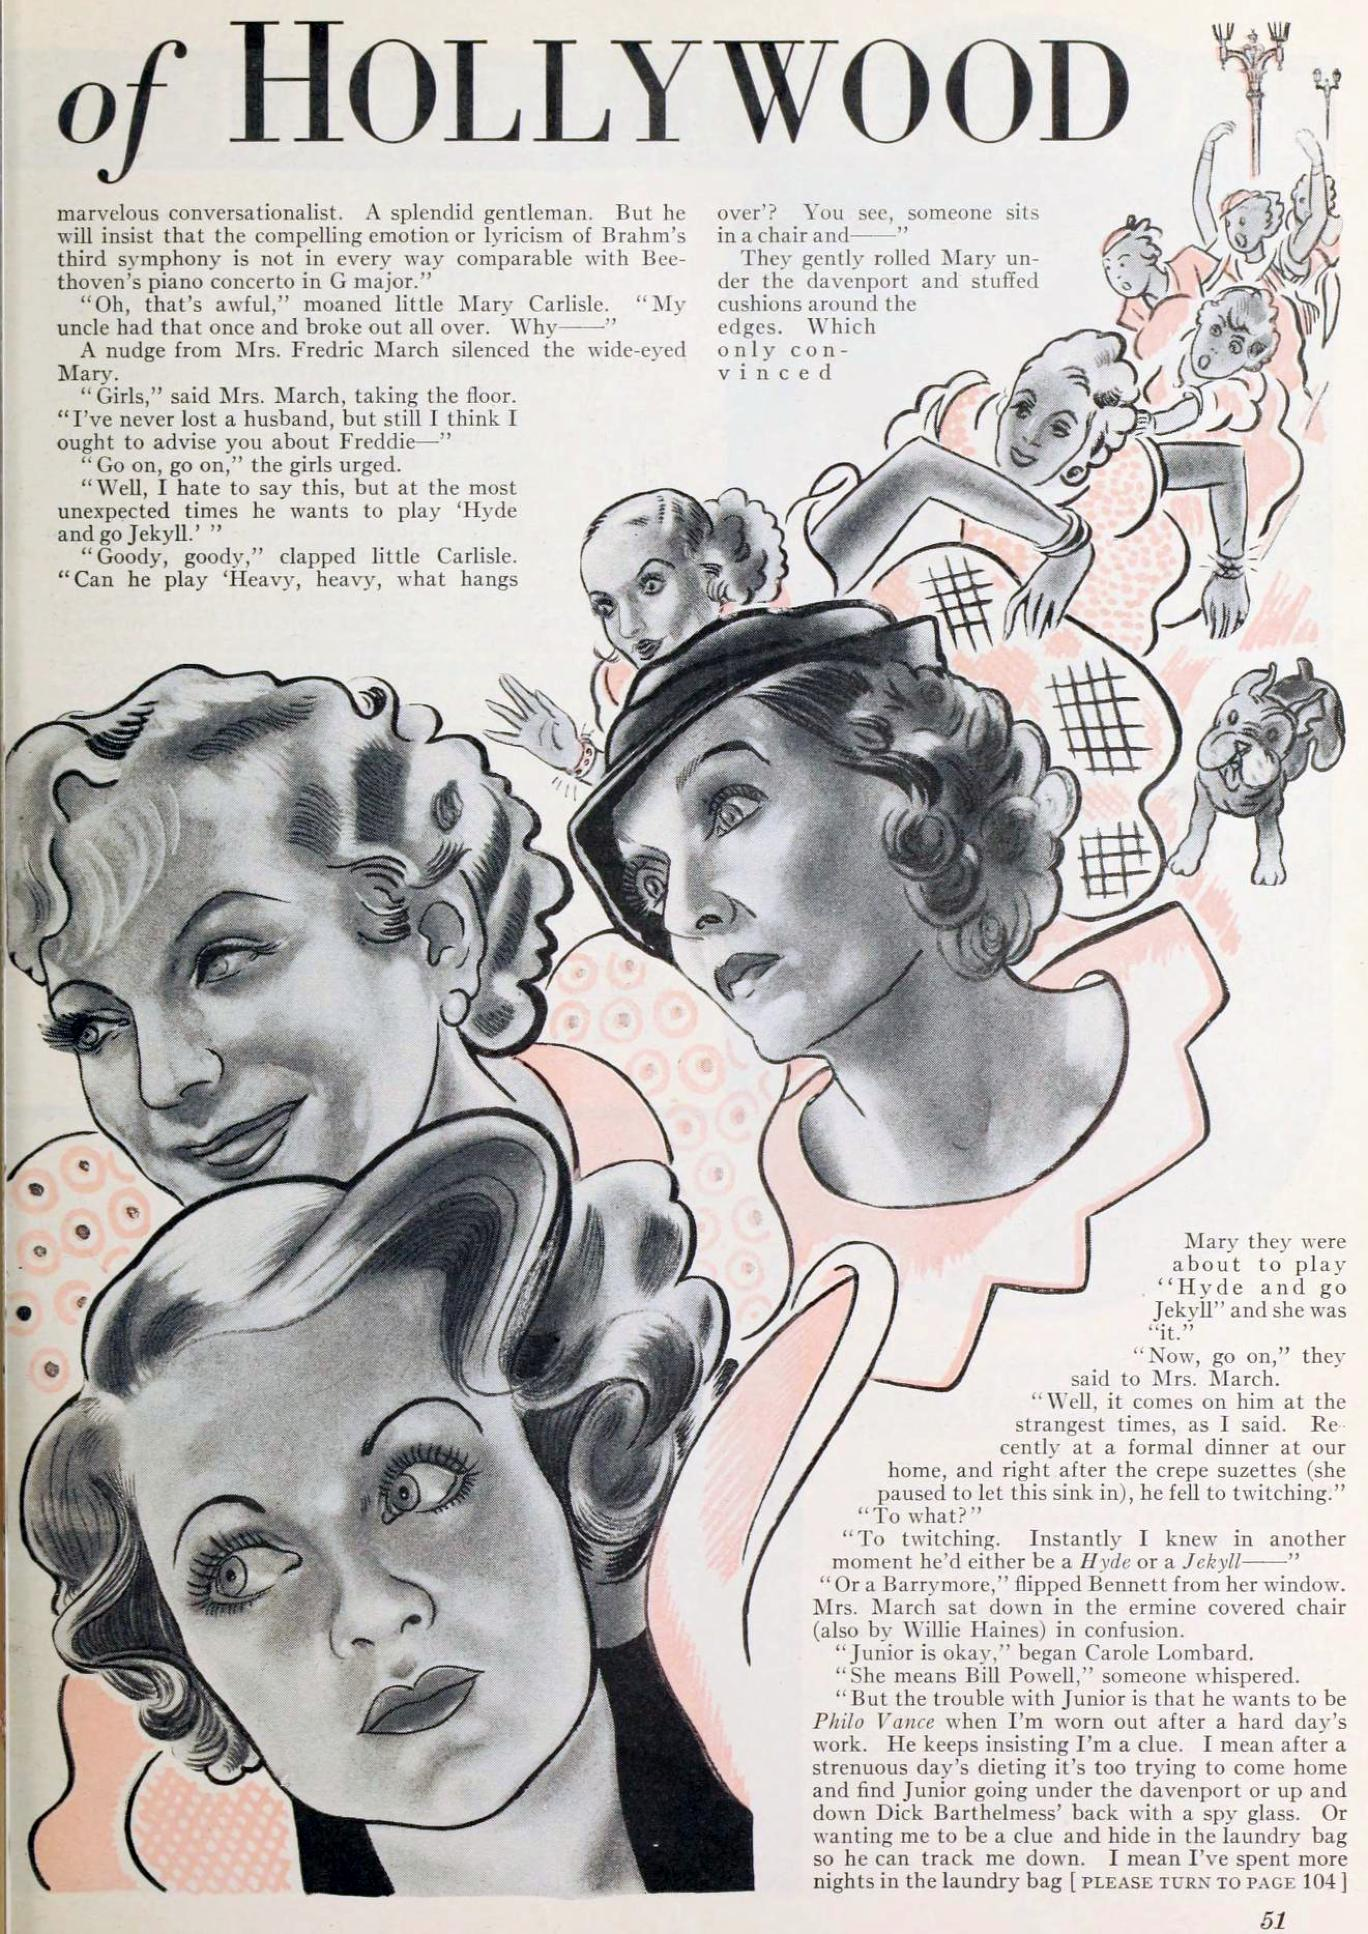 carole lombard photoplay january 1934ba